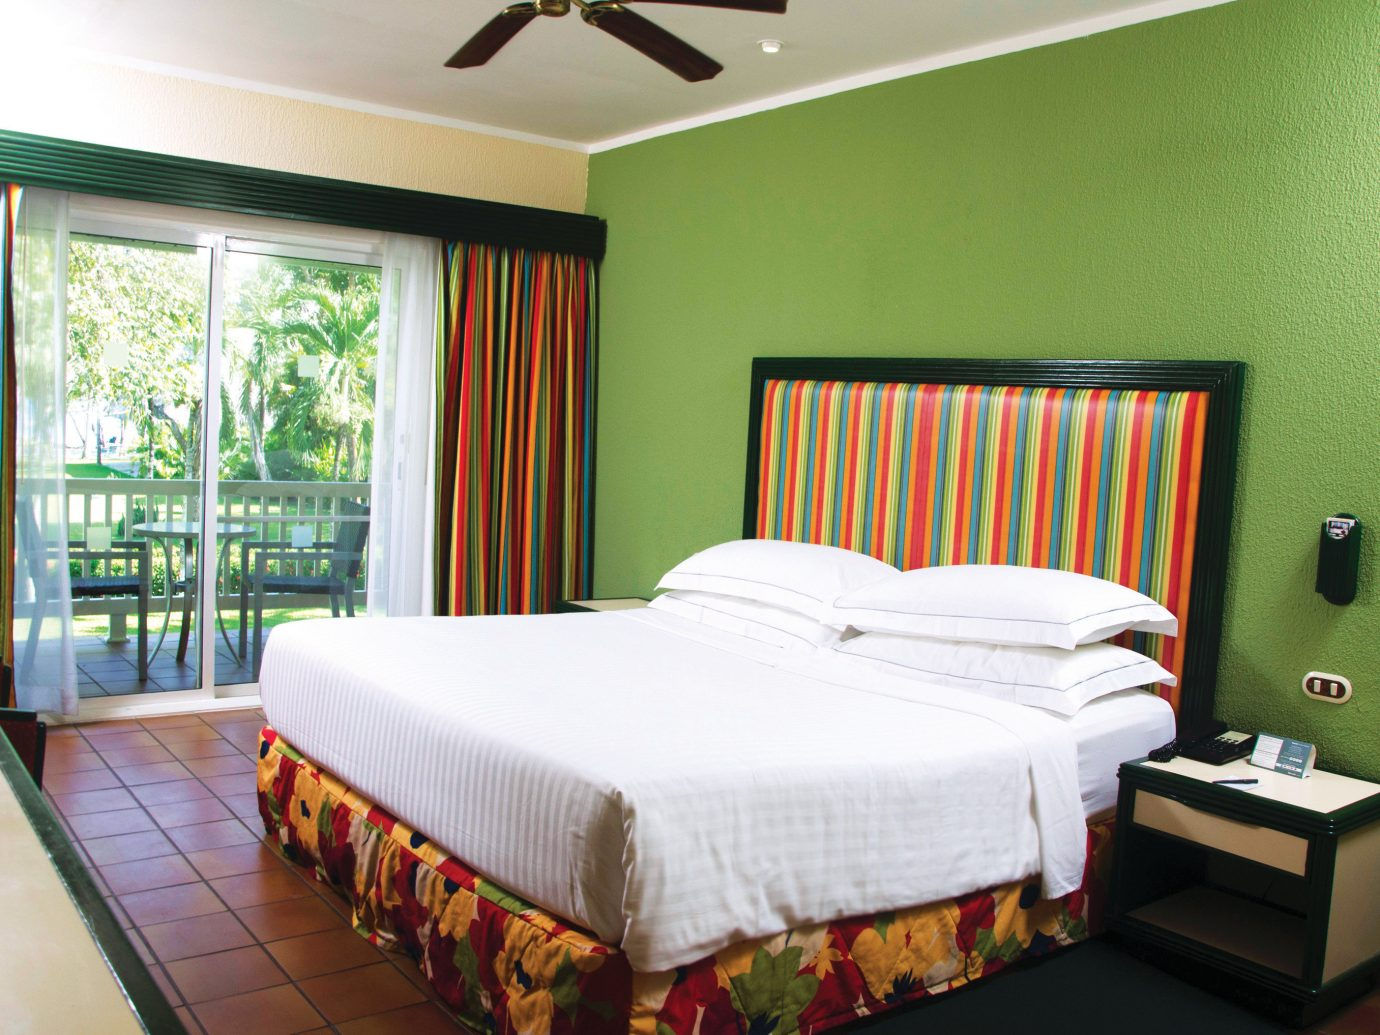 Bedroom at Barcelo Tambor in Costa Rica